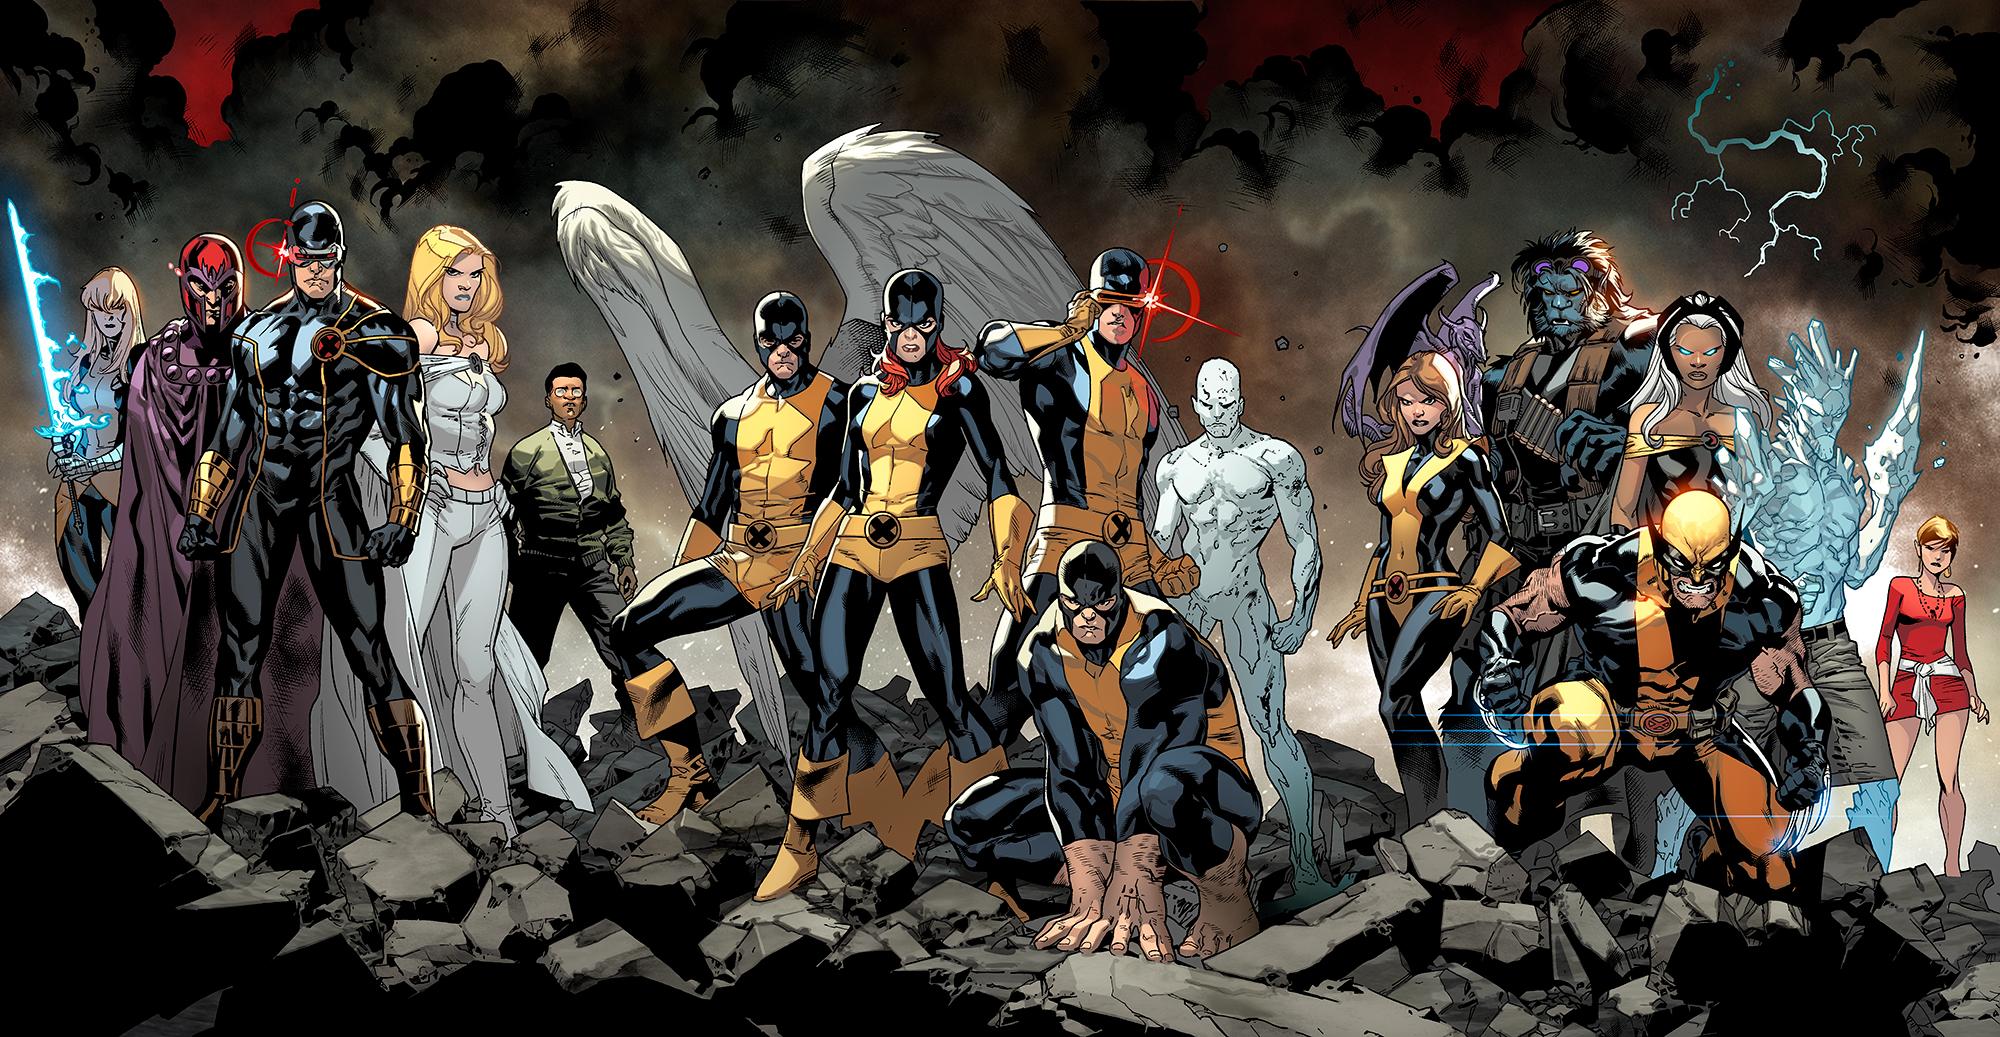 Deadpool Wallpaper Hd 1080p Hd X Men Backgrounds Pixelstalk Net